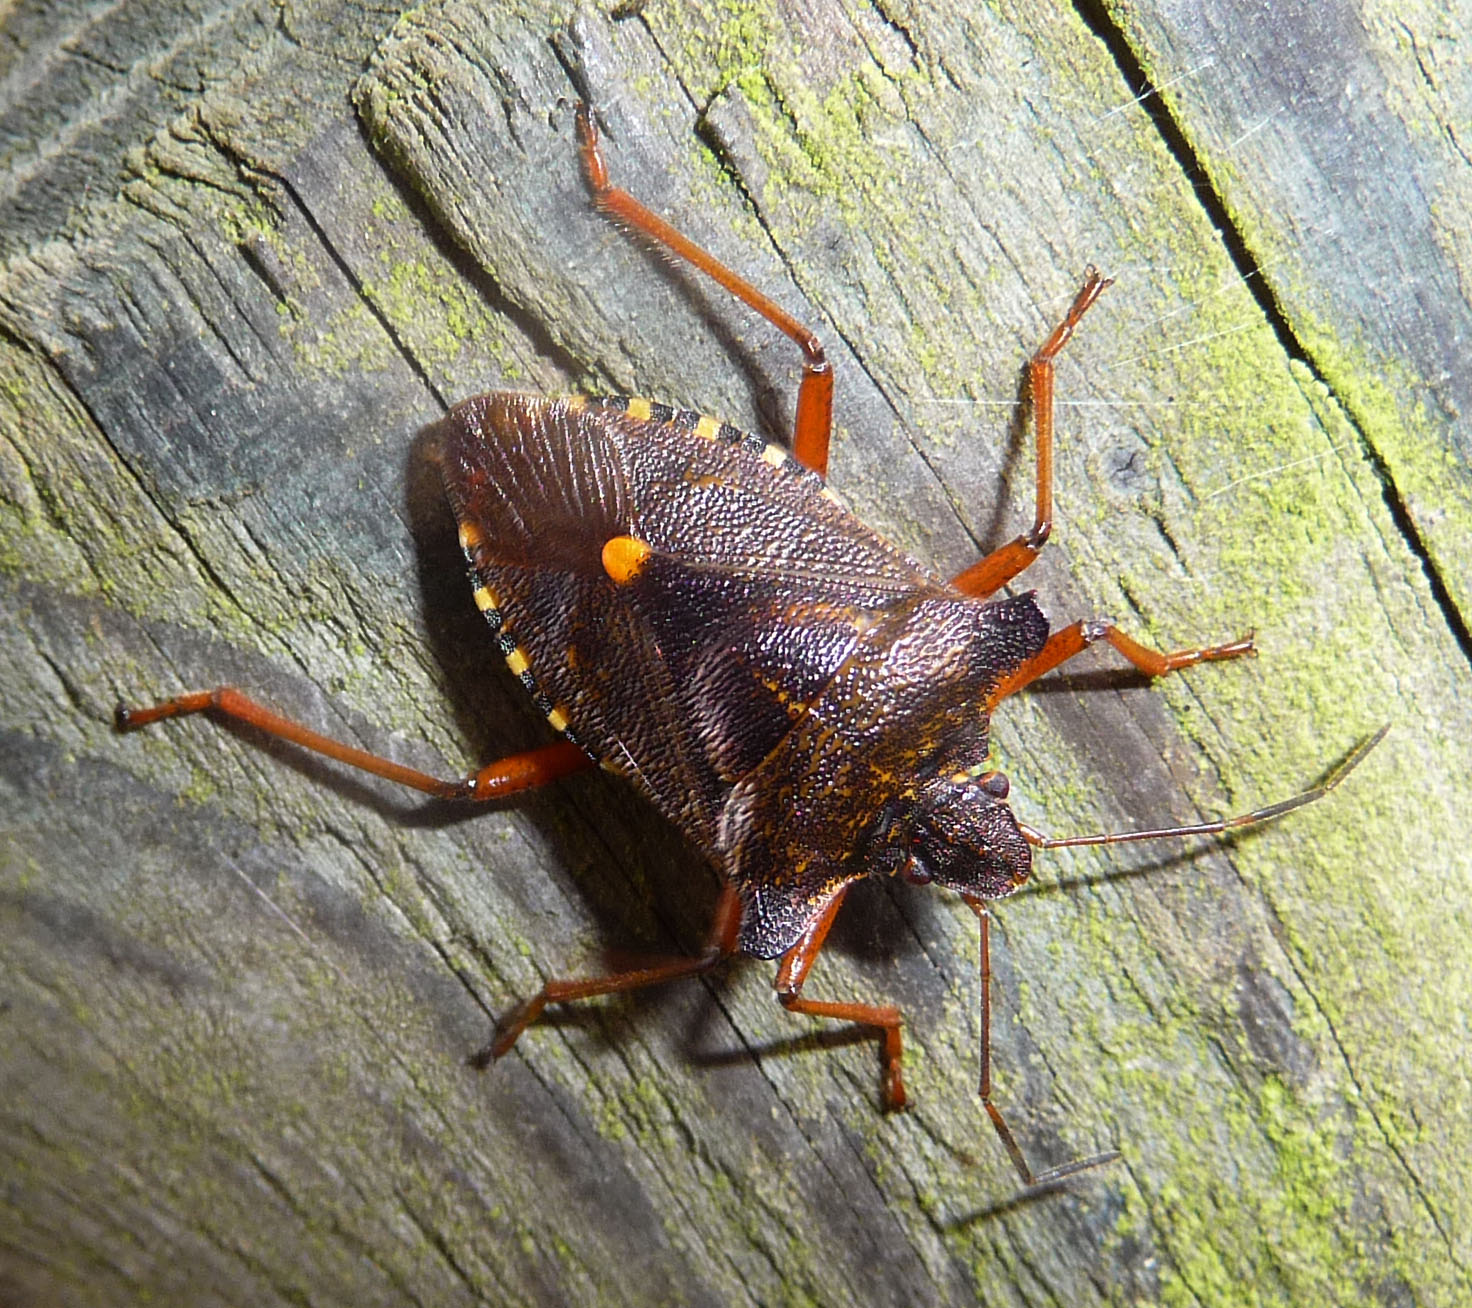 File:Red-legged Sheild bug Pentatoma rufipes. - Flickr - gailhampshire.jpg